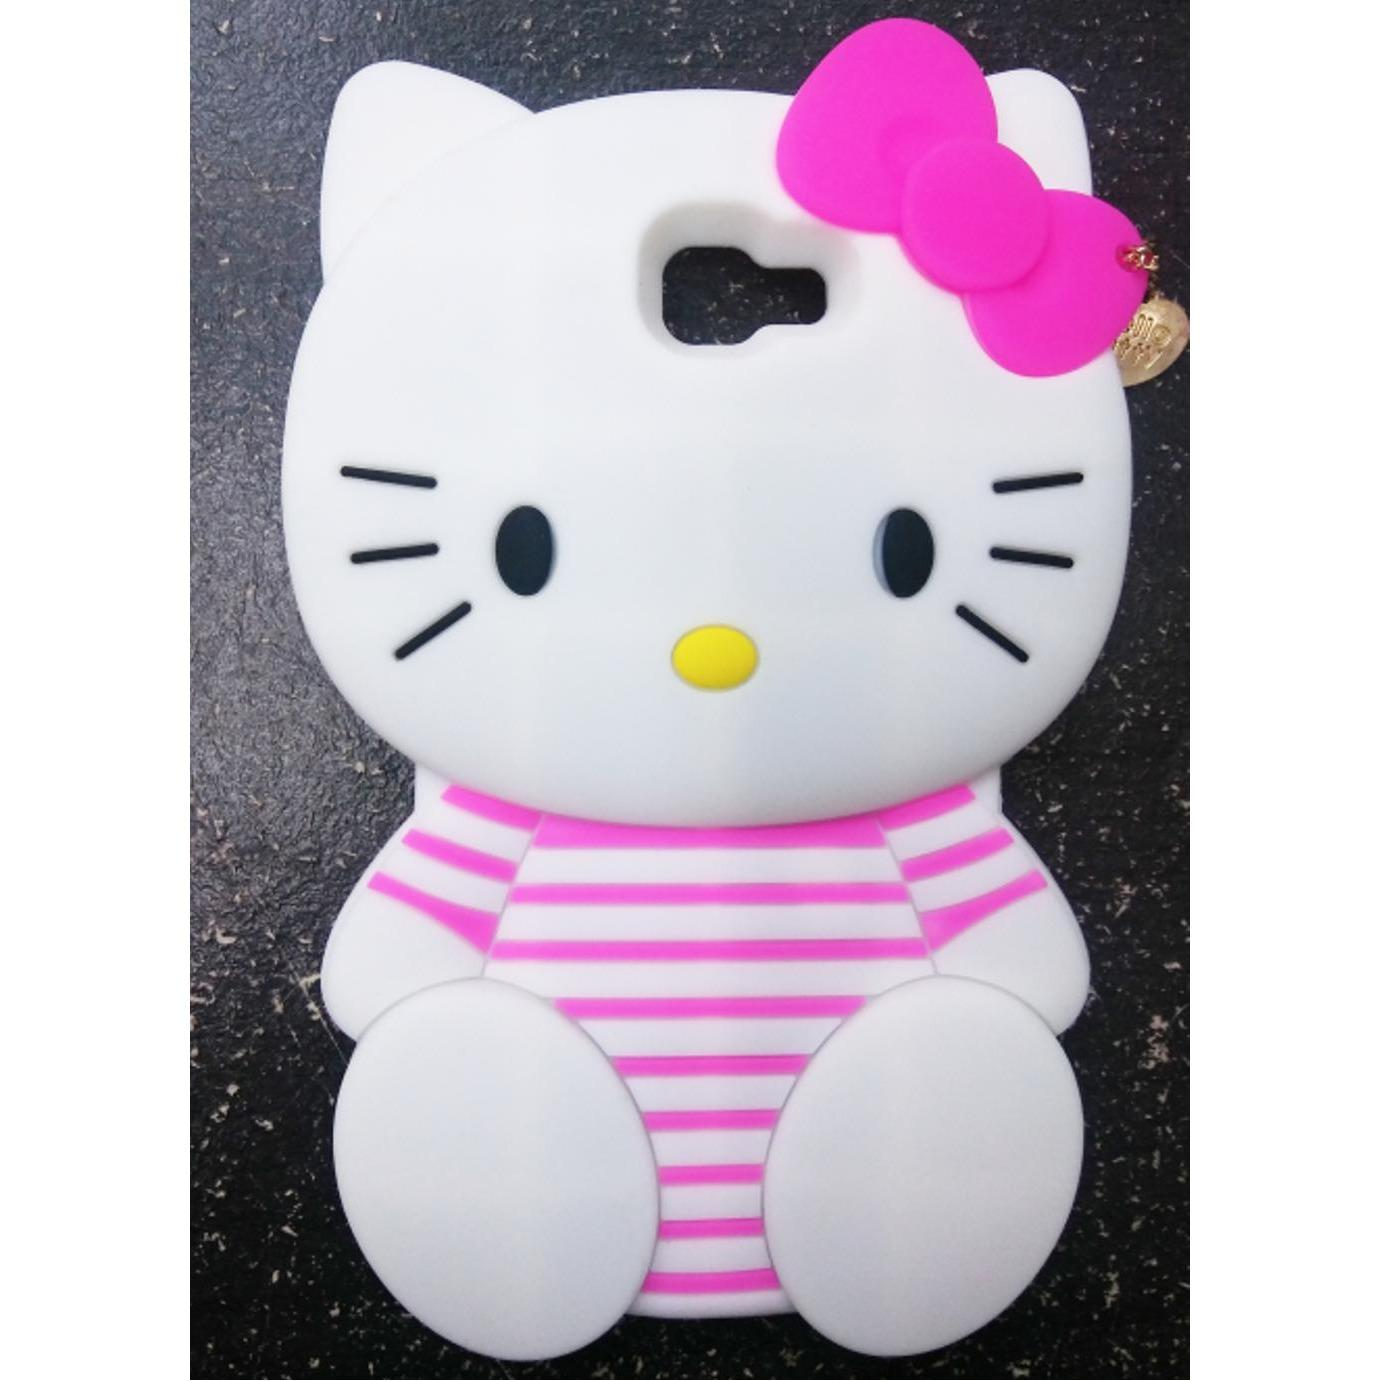 SHAKIRA_SHOP-Softcase Boneka Hello Kitty For Samsung J5 #Cover Hp Lucu